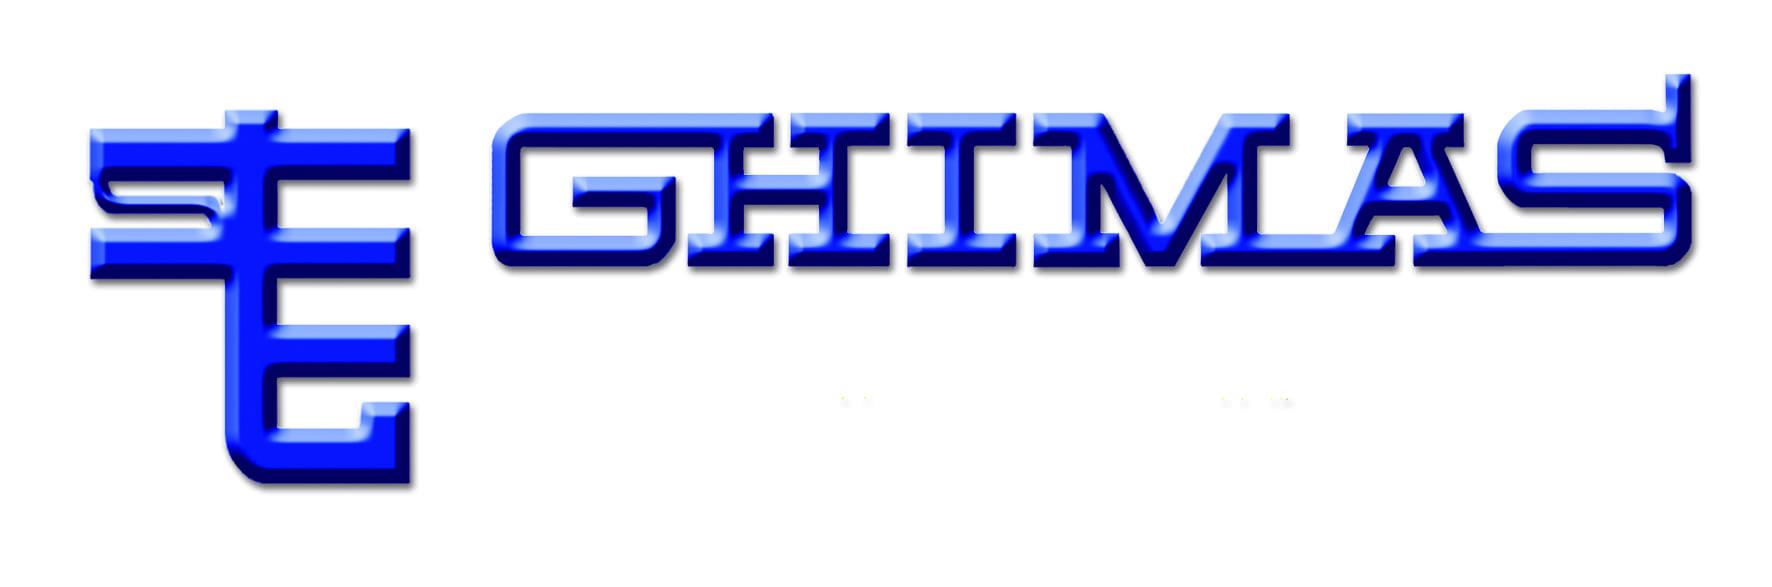 2017 logo ghimas ufficiale compresso